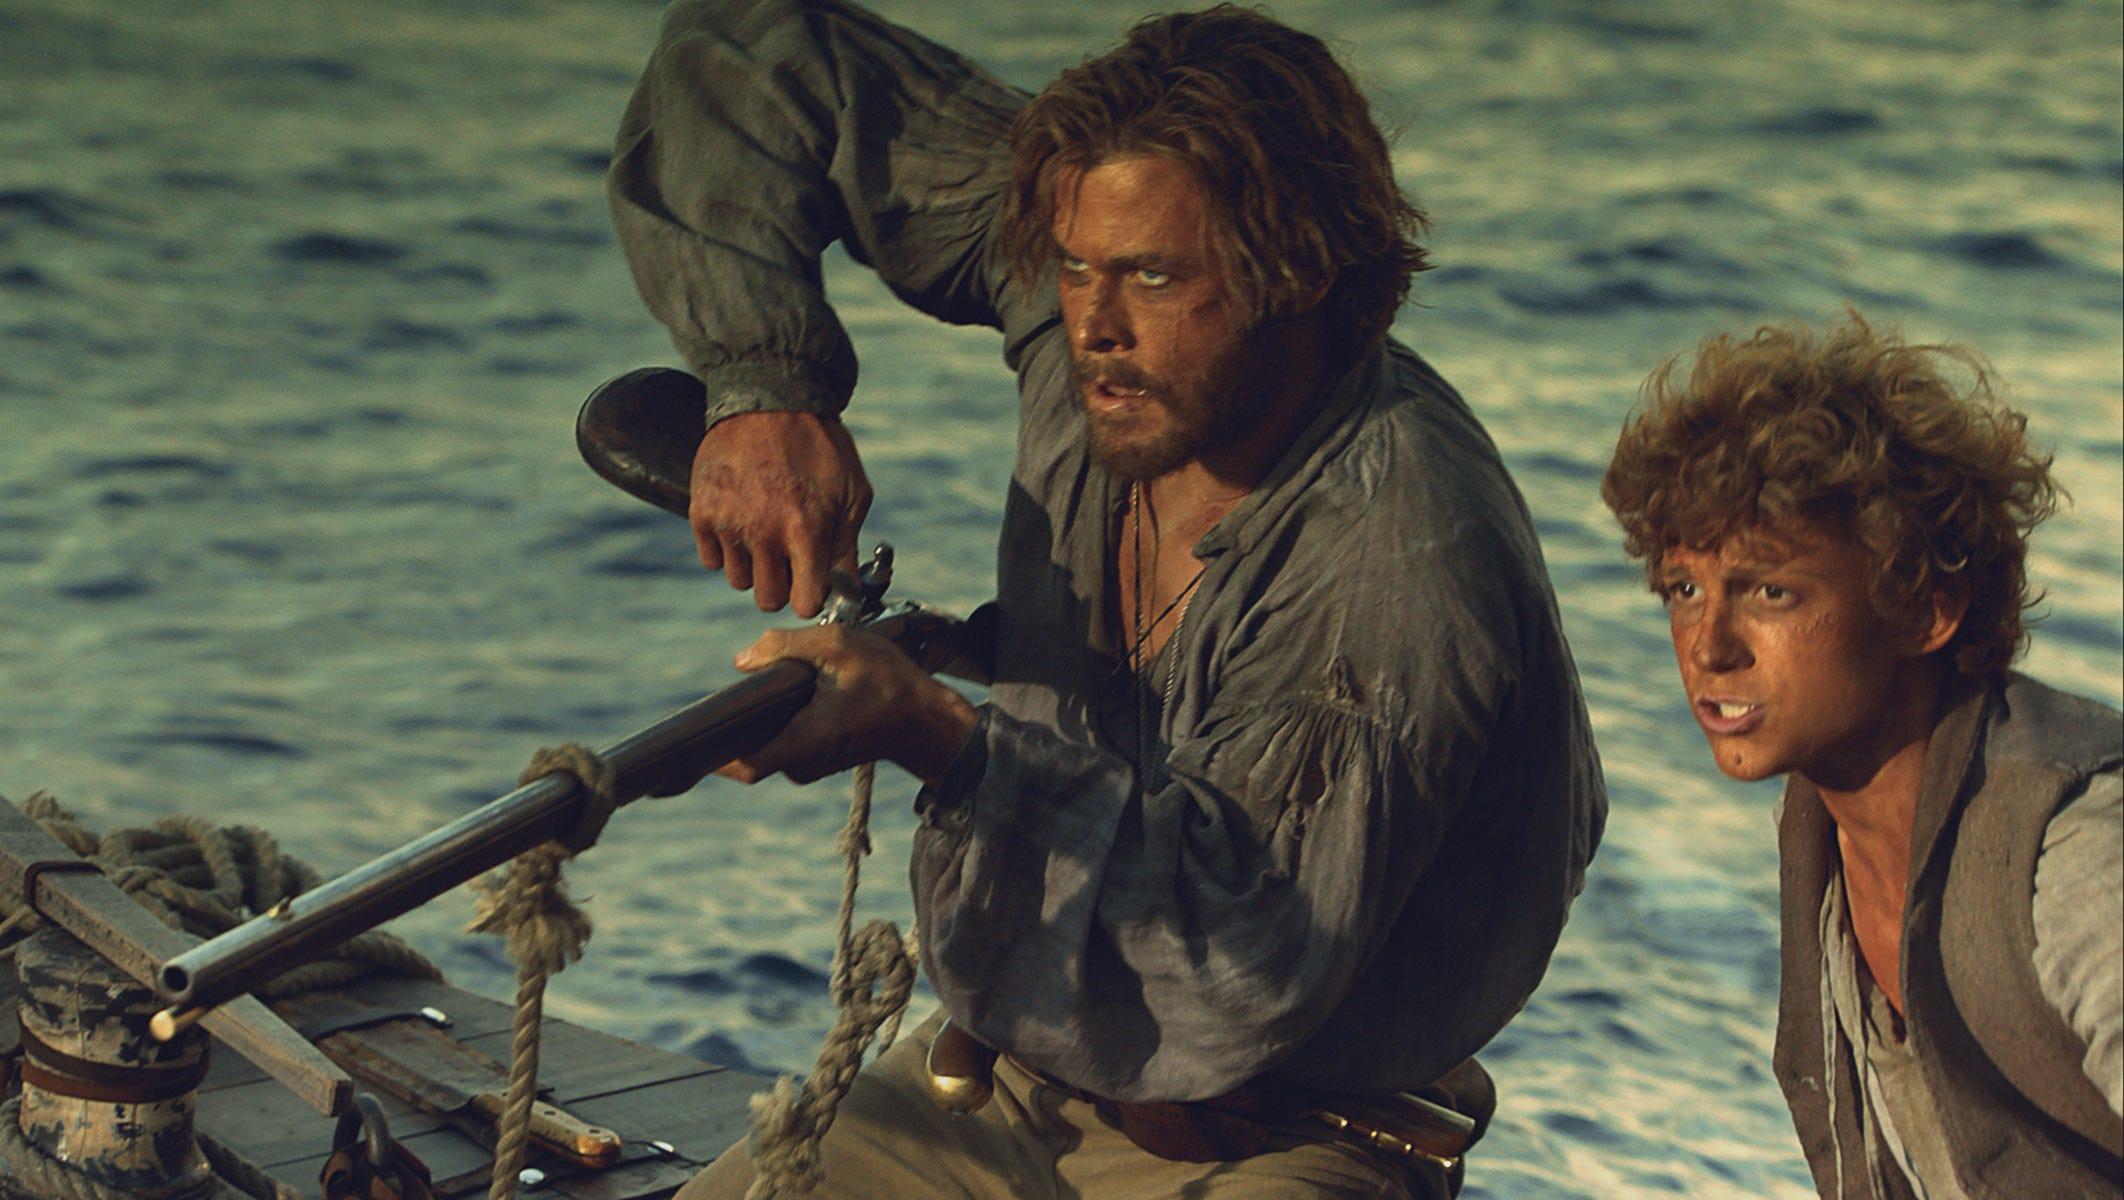 Heart Of The Sea Actors Bond Over Maritime Travails